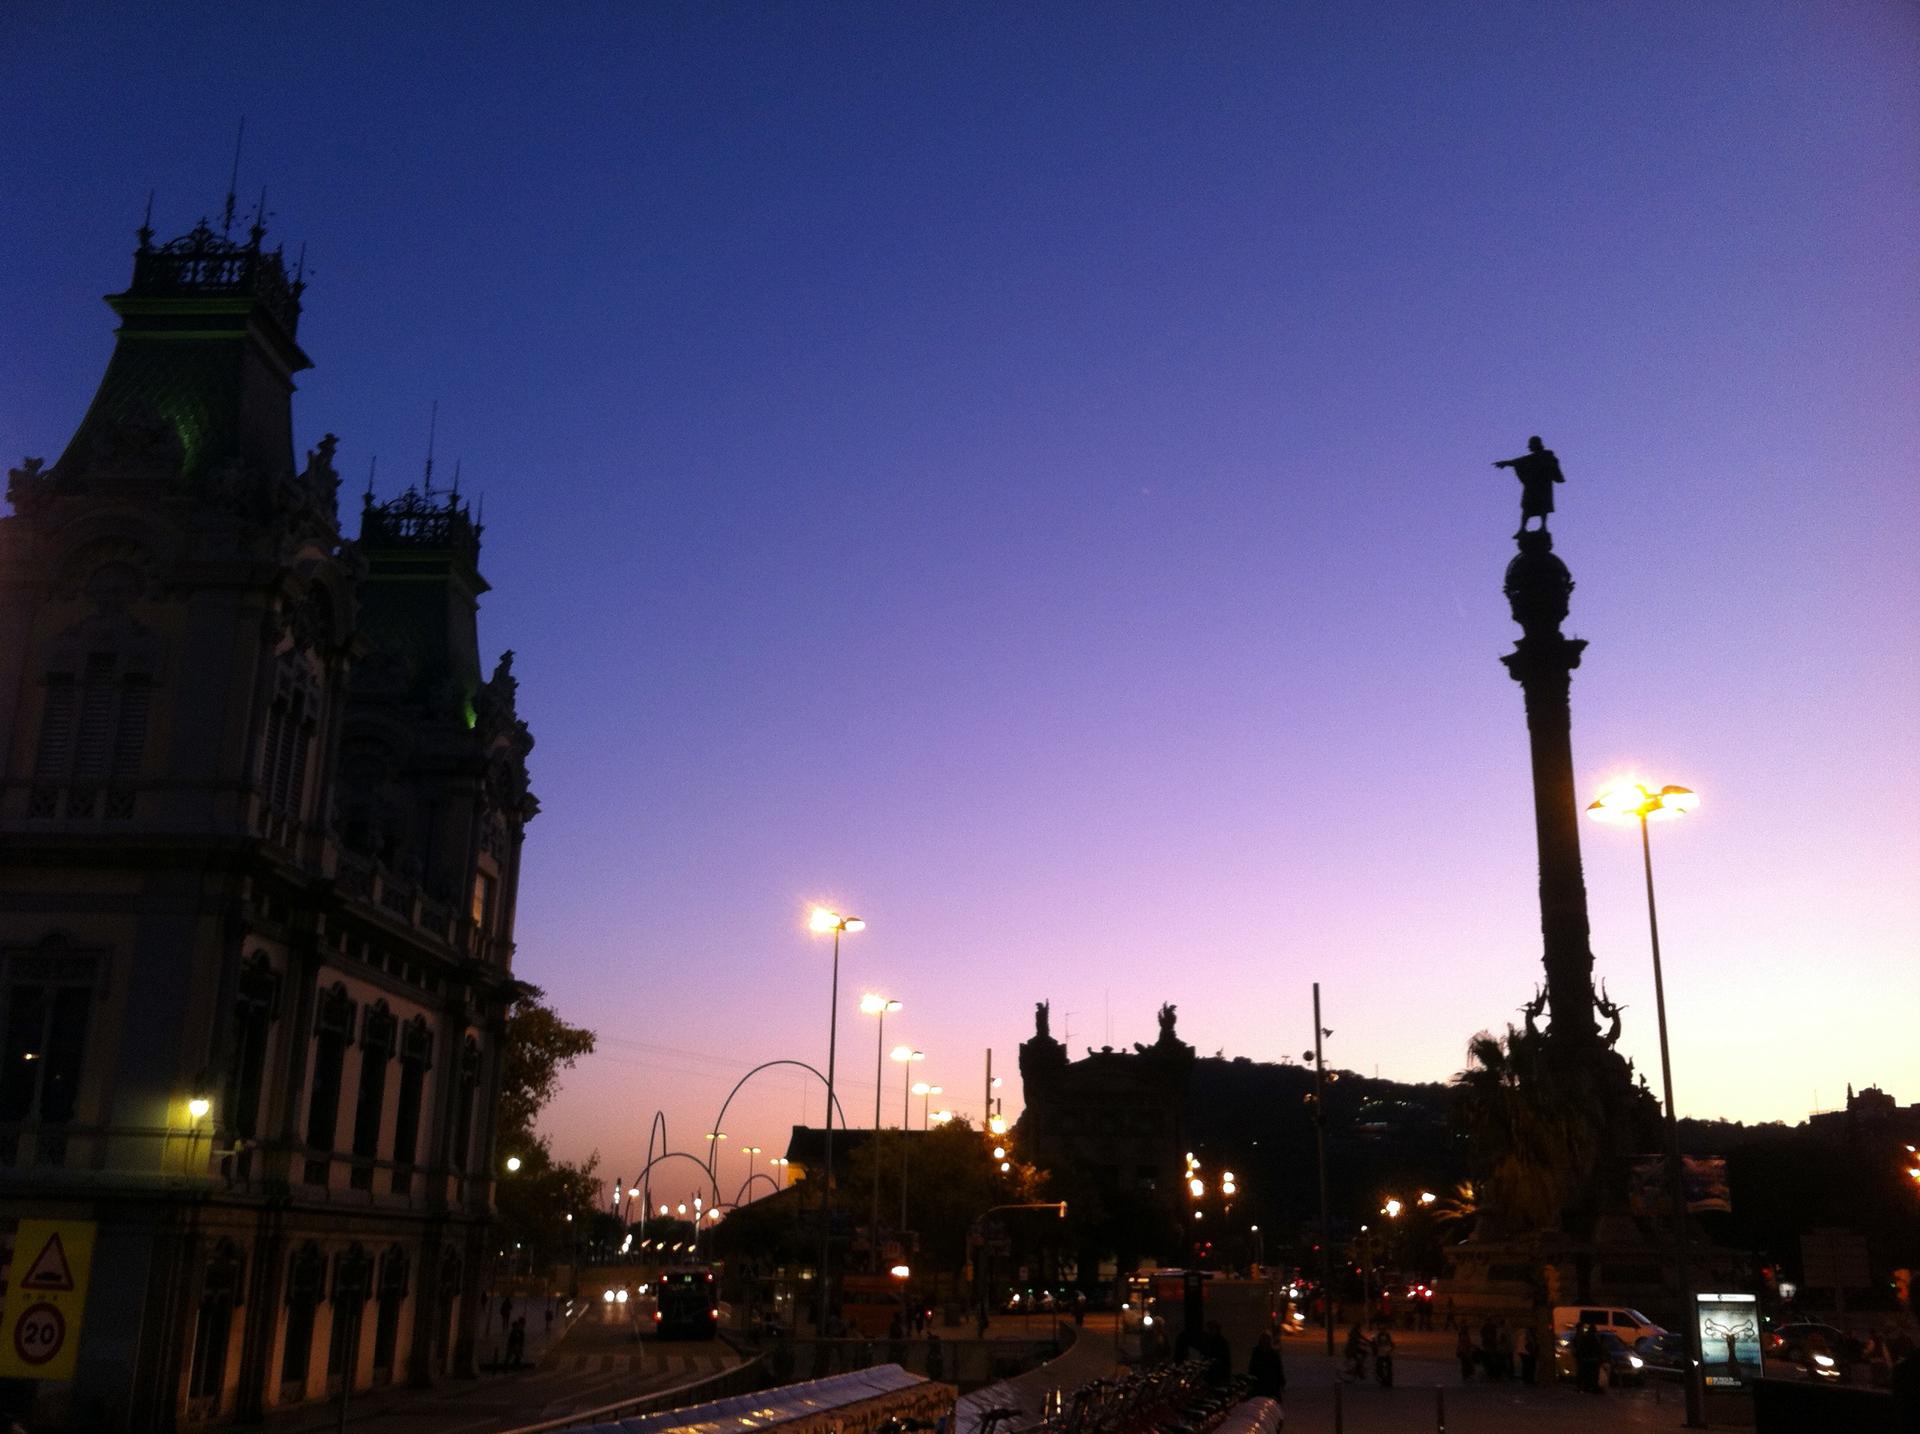 Sunset in Barcelona | gato.gordi, architecture, city, evening